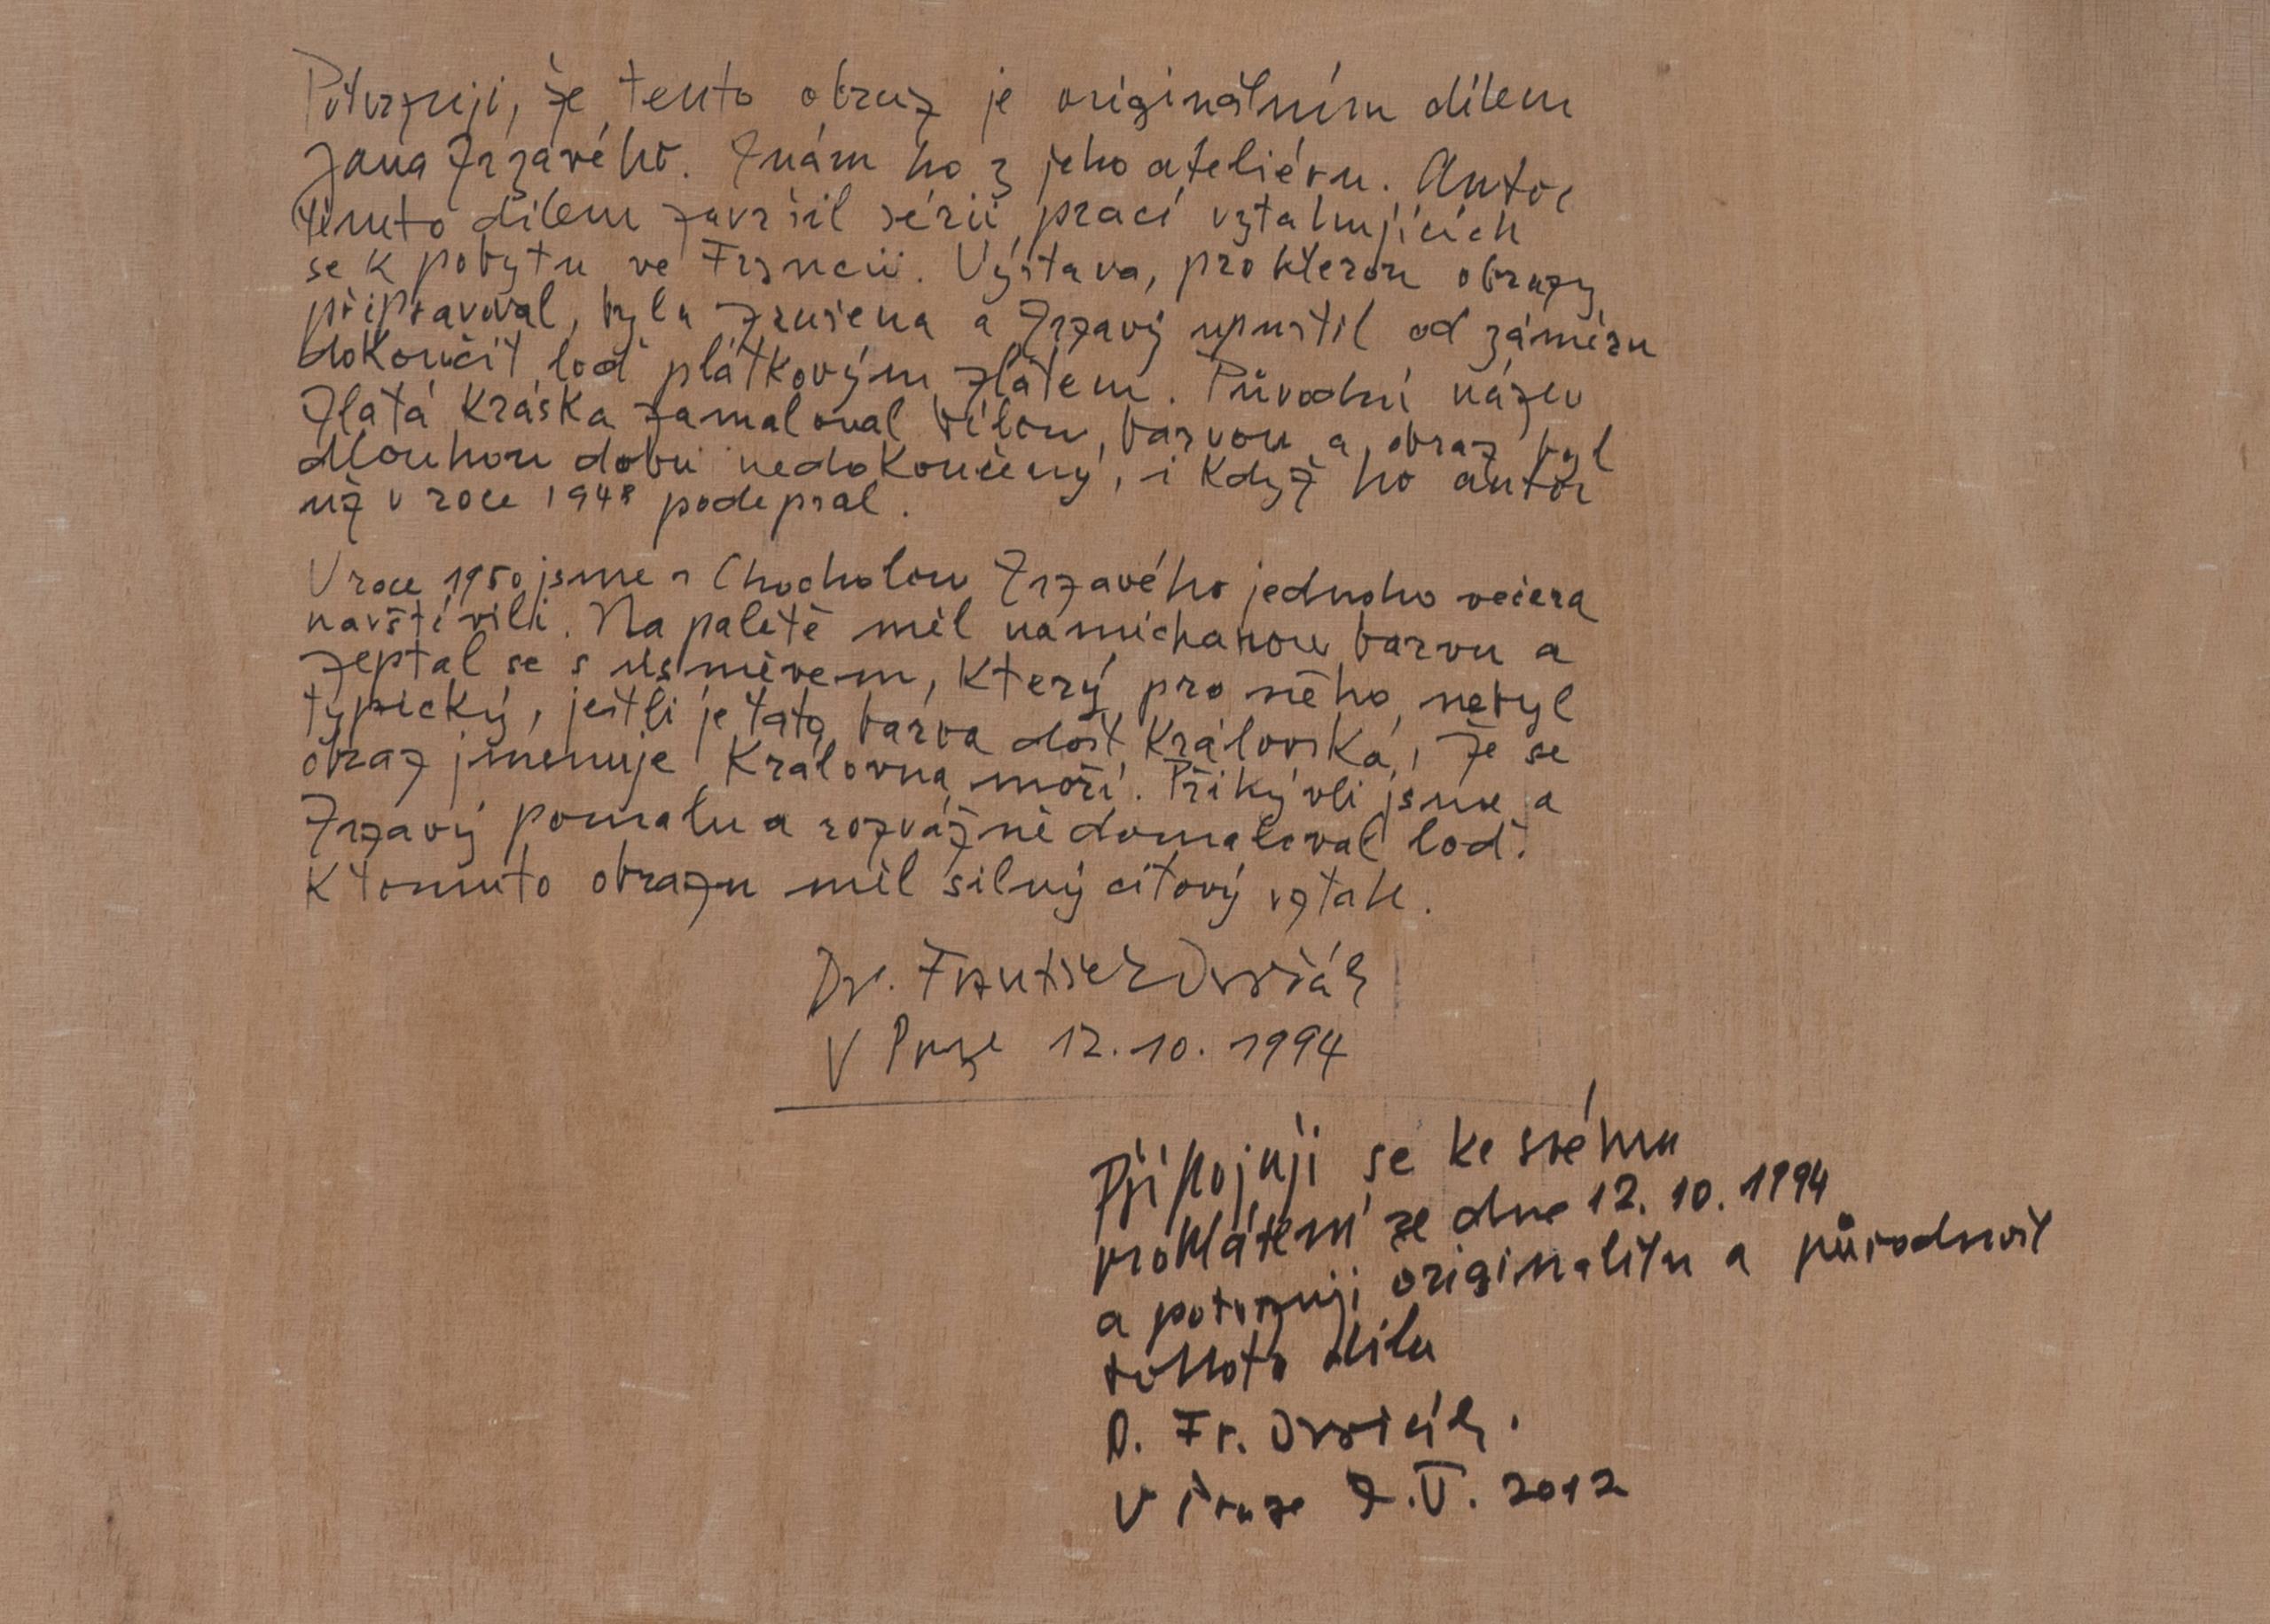 kralovna-mori-arthouse-hejtmanek-vecerni-aukce-2020-3